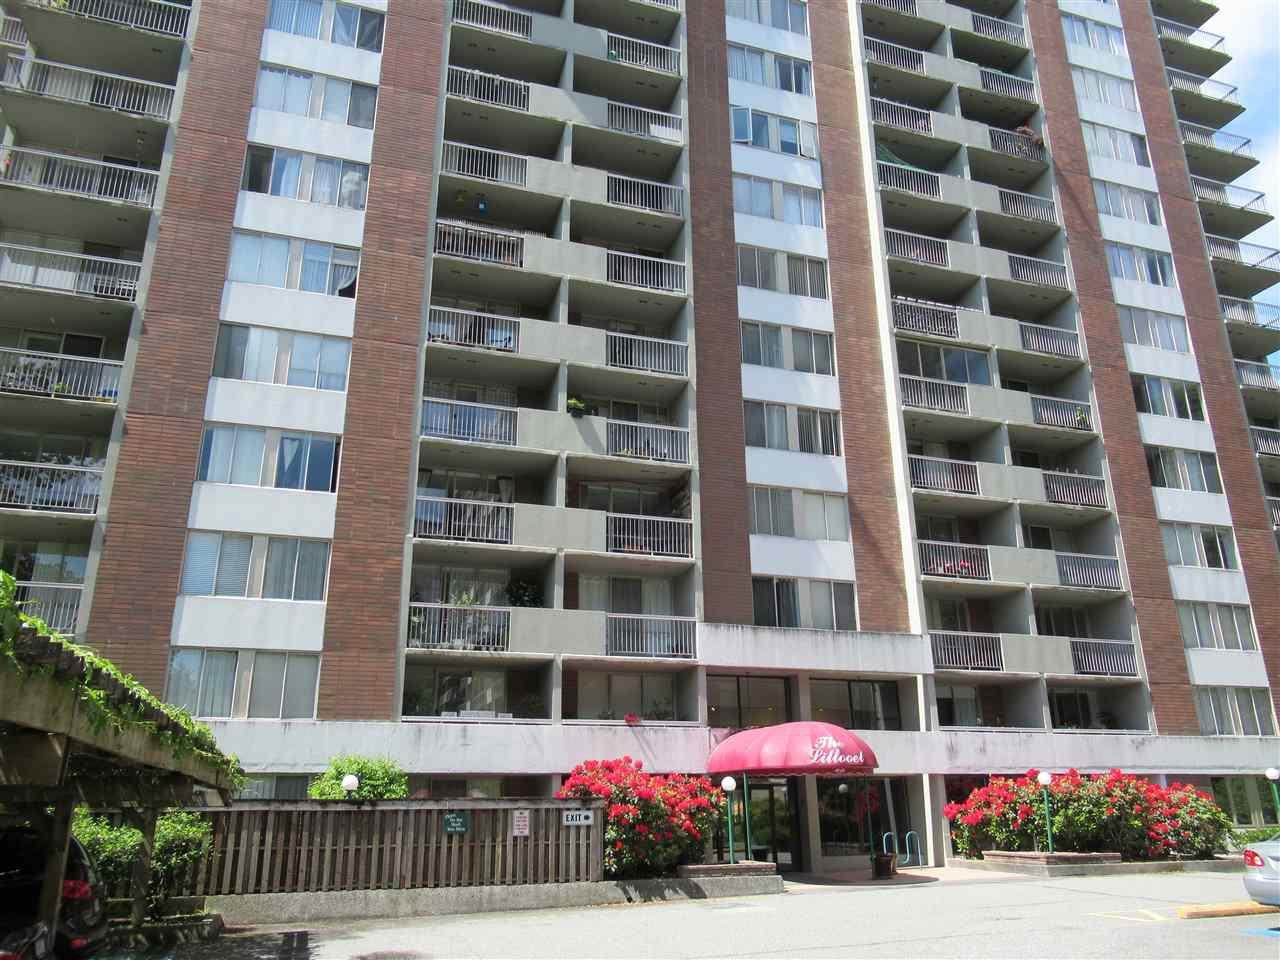 "Main Photo: 1101 2016 FULLERTON Avenue in North Vancouver: Pemberton NV Condo for sale in ""Woodcroft Estates"" : MLS®# R2412807"